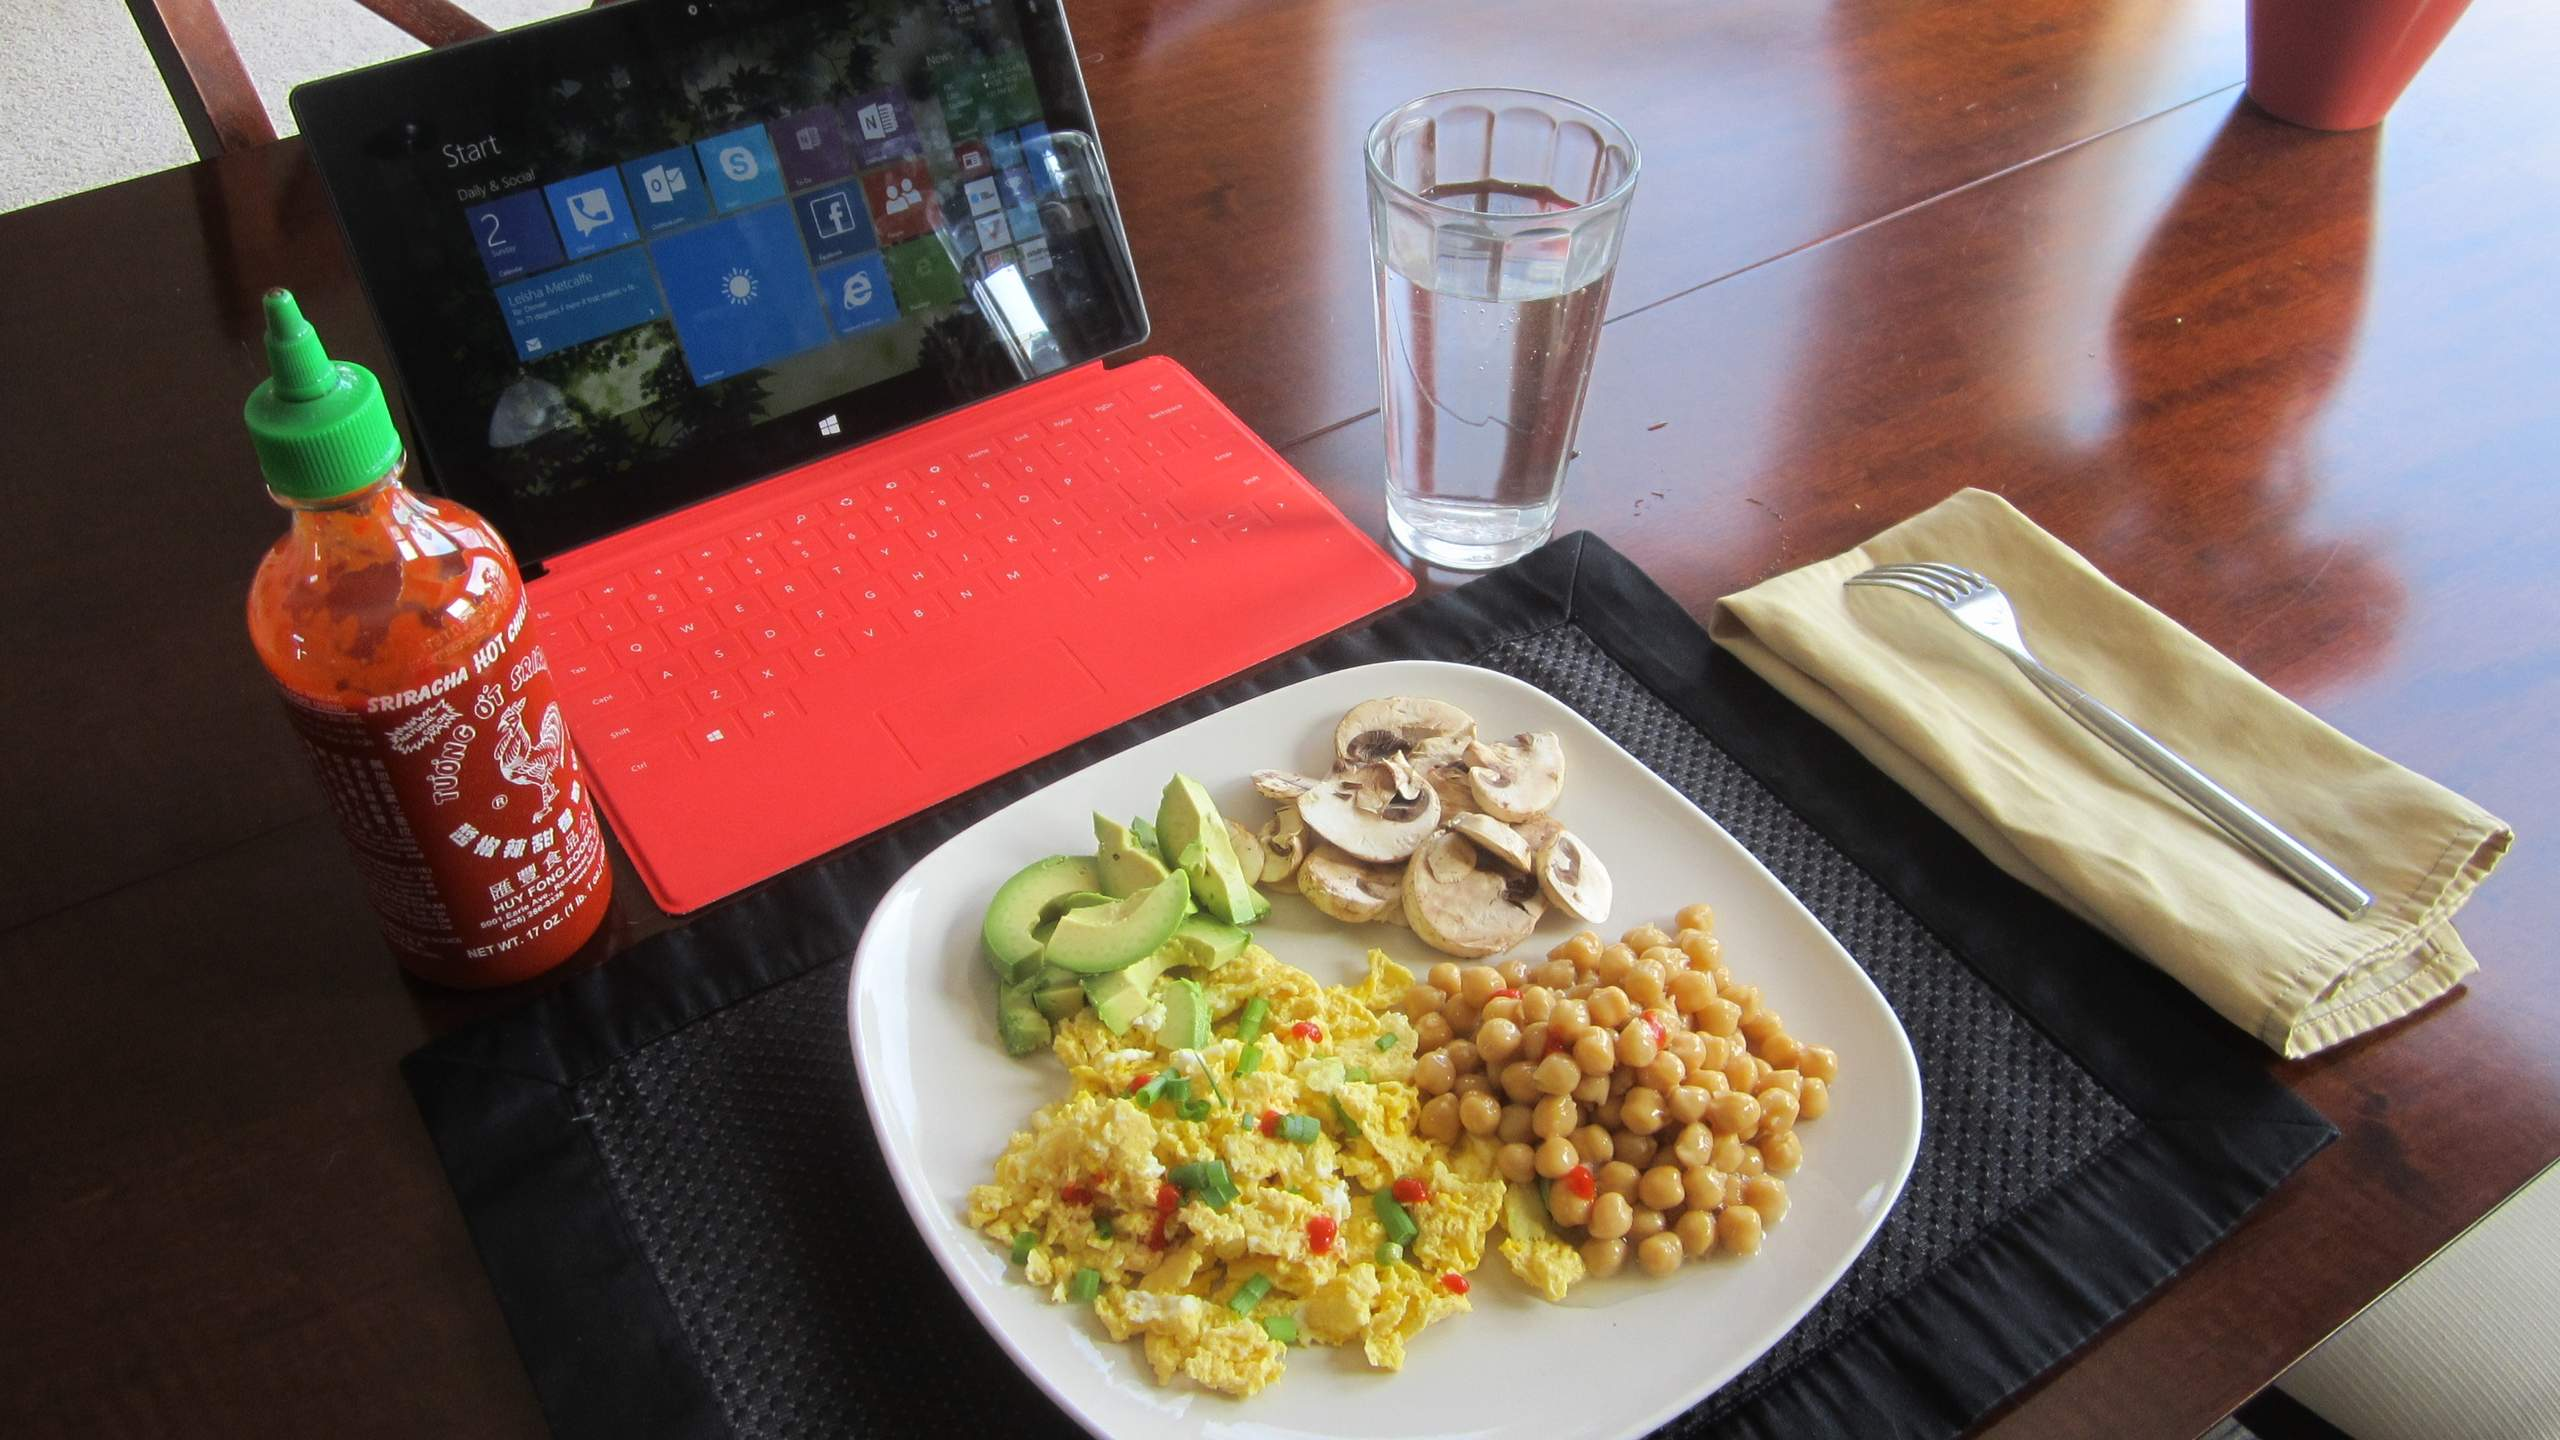 Avocado, mushrooms, chick peas, and microwaved eggs for breakfast.